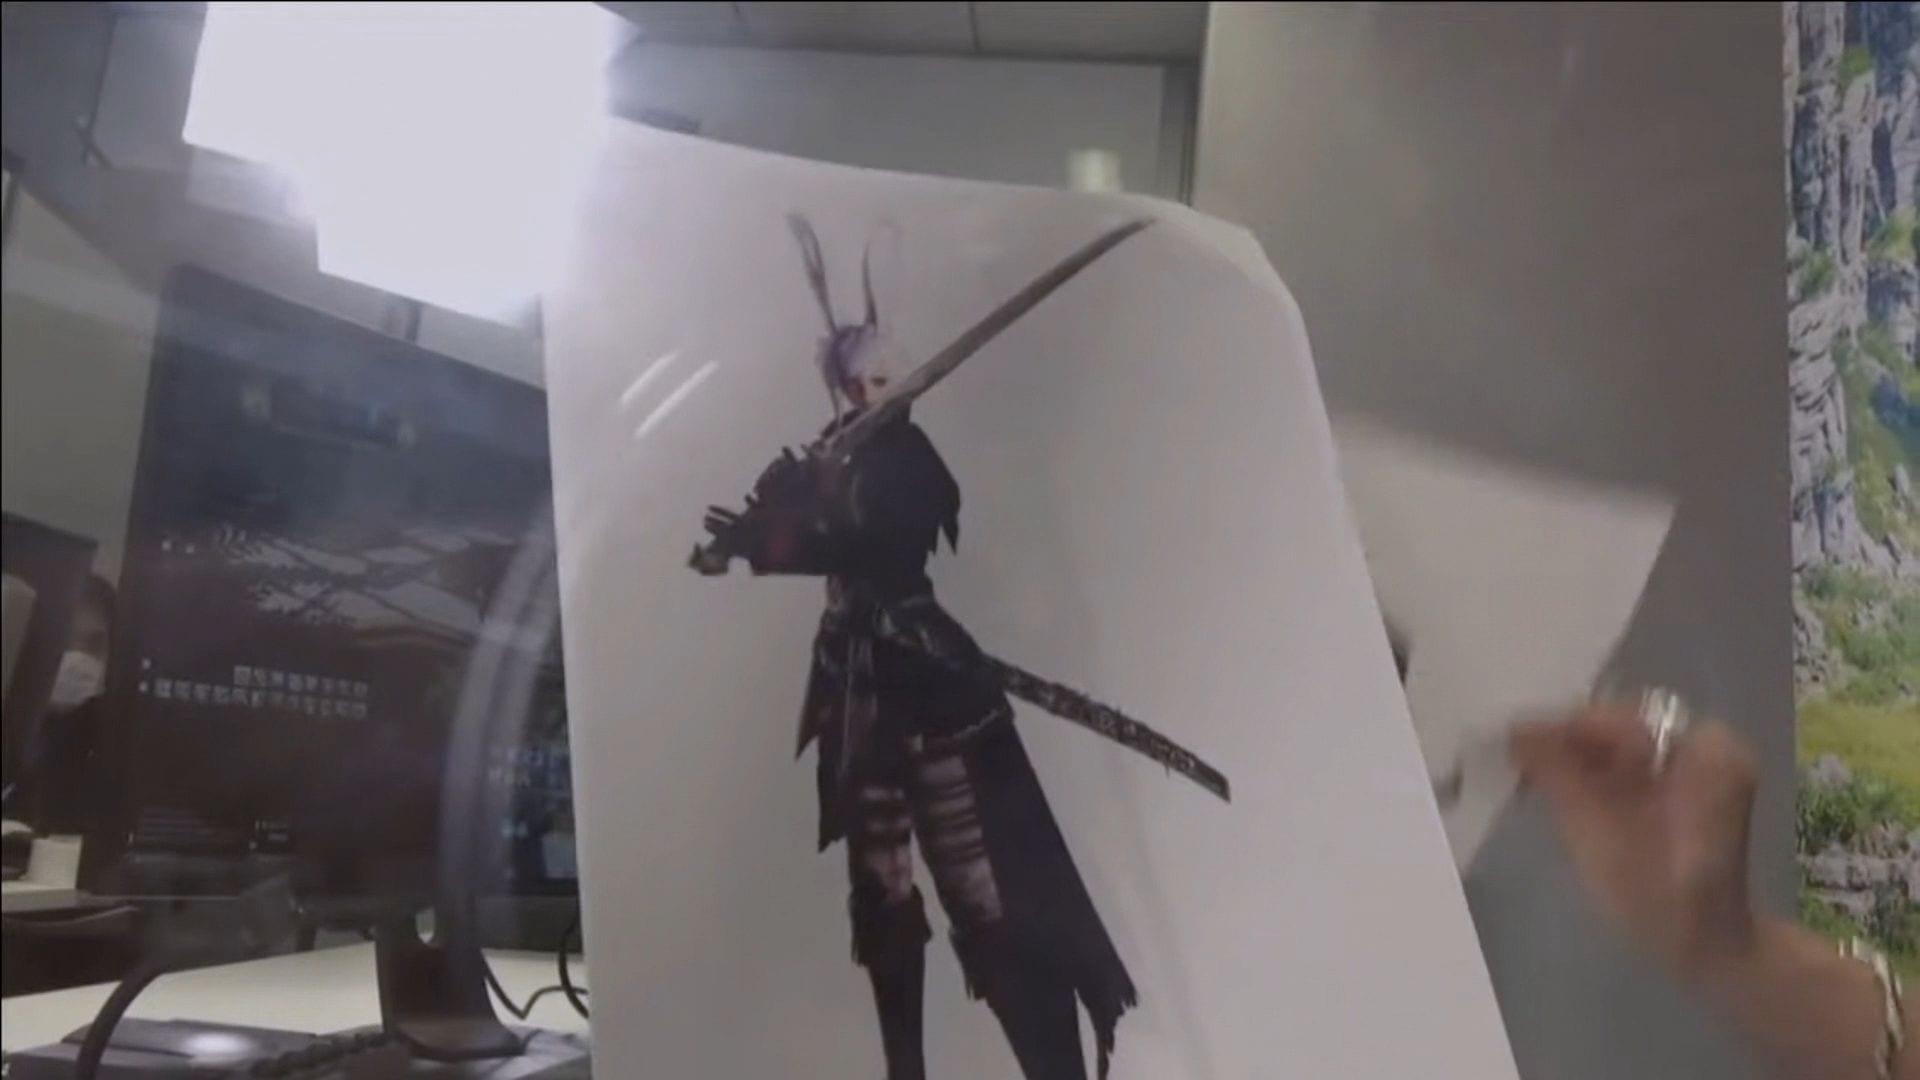 Final-Fantasy-XIV-Screenshot-2020-11-27-13-39-01.jpg